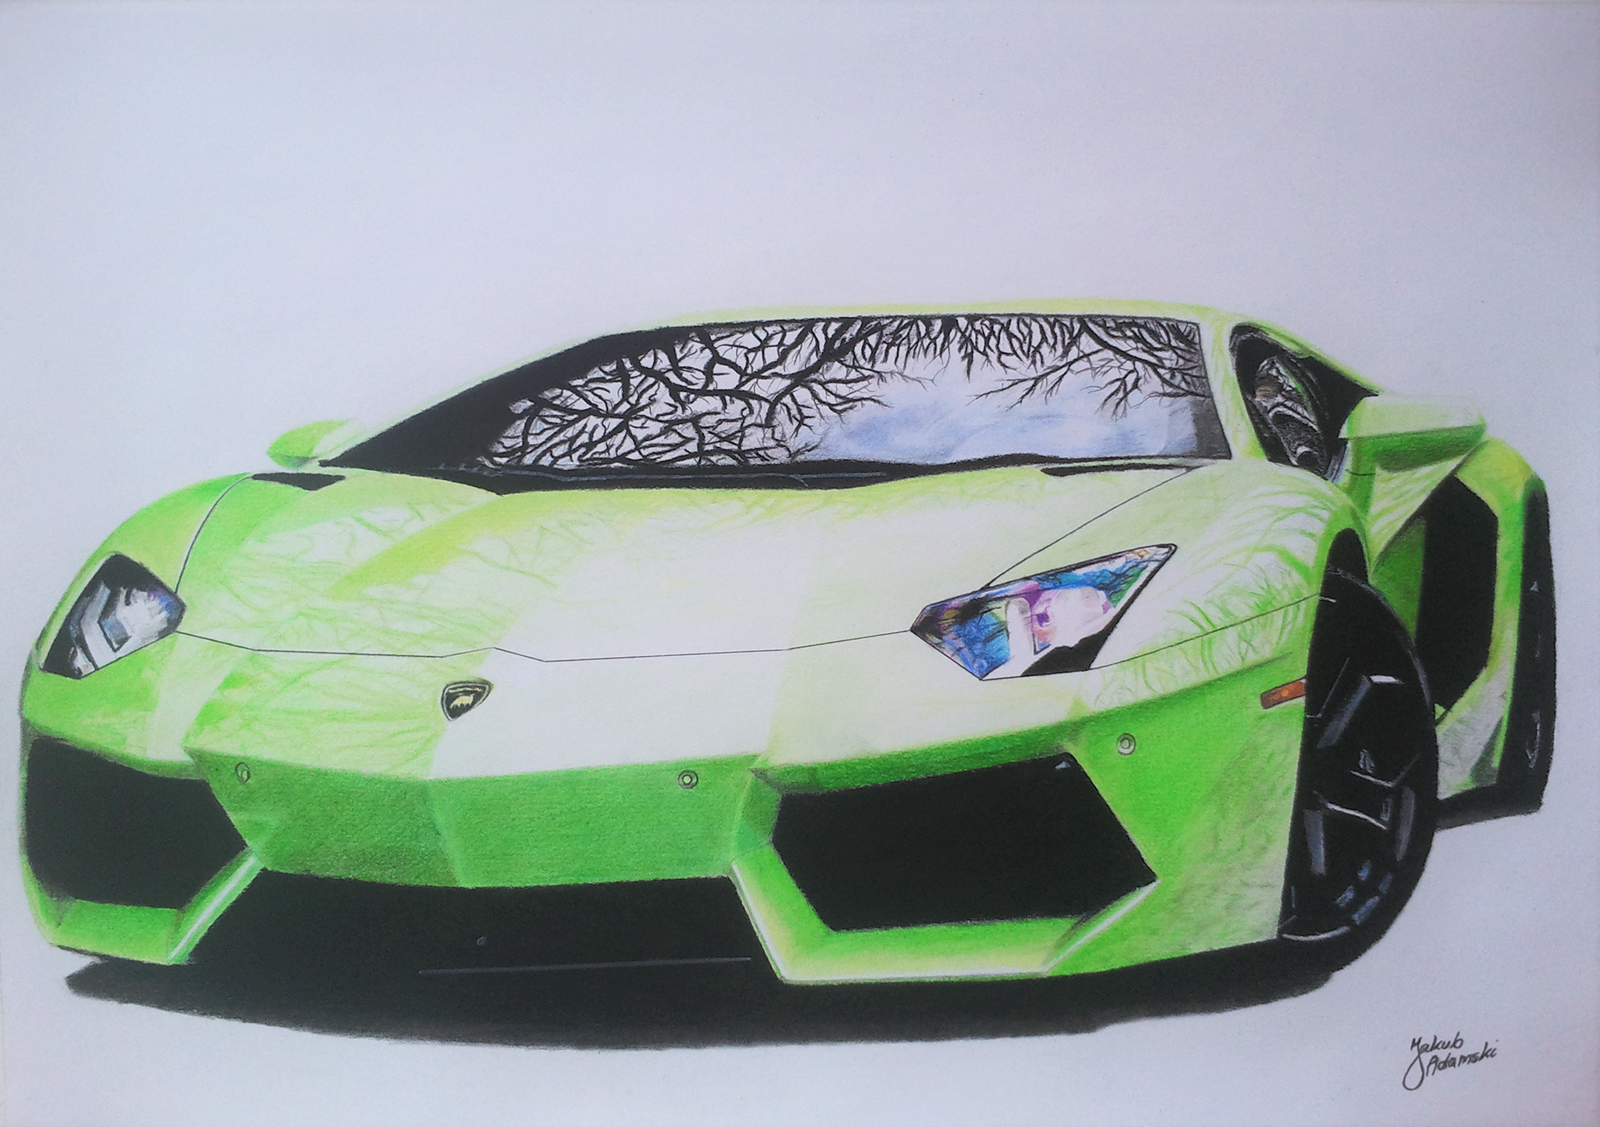 Lamborghini Aventador LP700-4 - Color Pencil by JakubQaazAdamski on on draw lamborghini gallardo, draw lamborghini sesto elemento, draw volvo s60, draw lamborghini murcielago, draw lamborghini diablo,